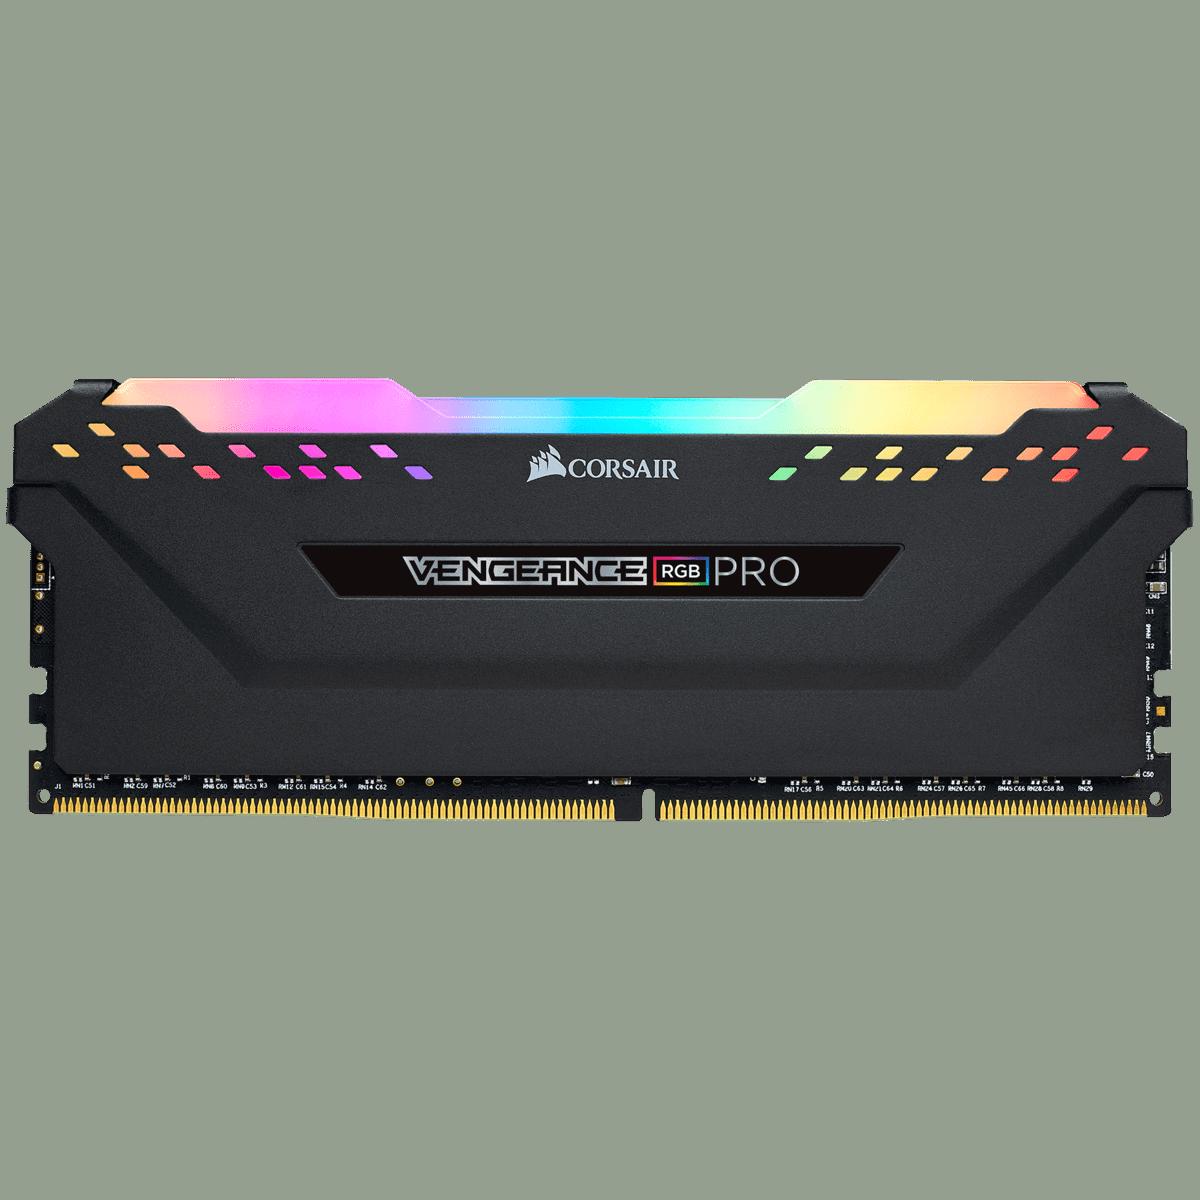 CORSAIR VENGEANCE RGB PRO 8GB DDR4 3000MHz